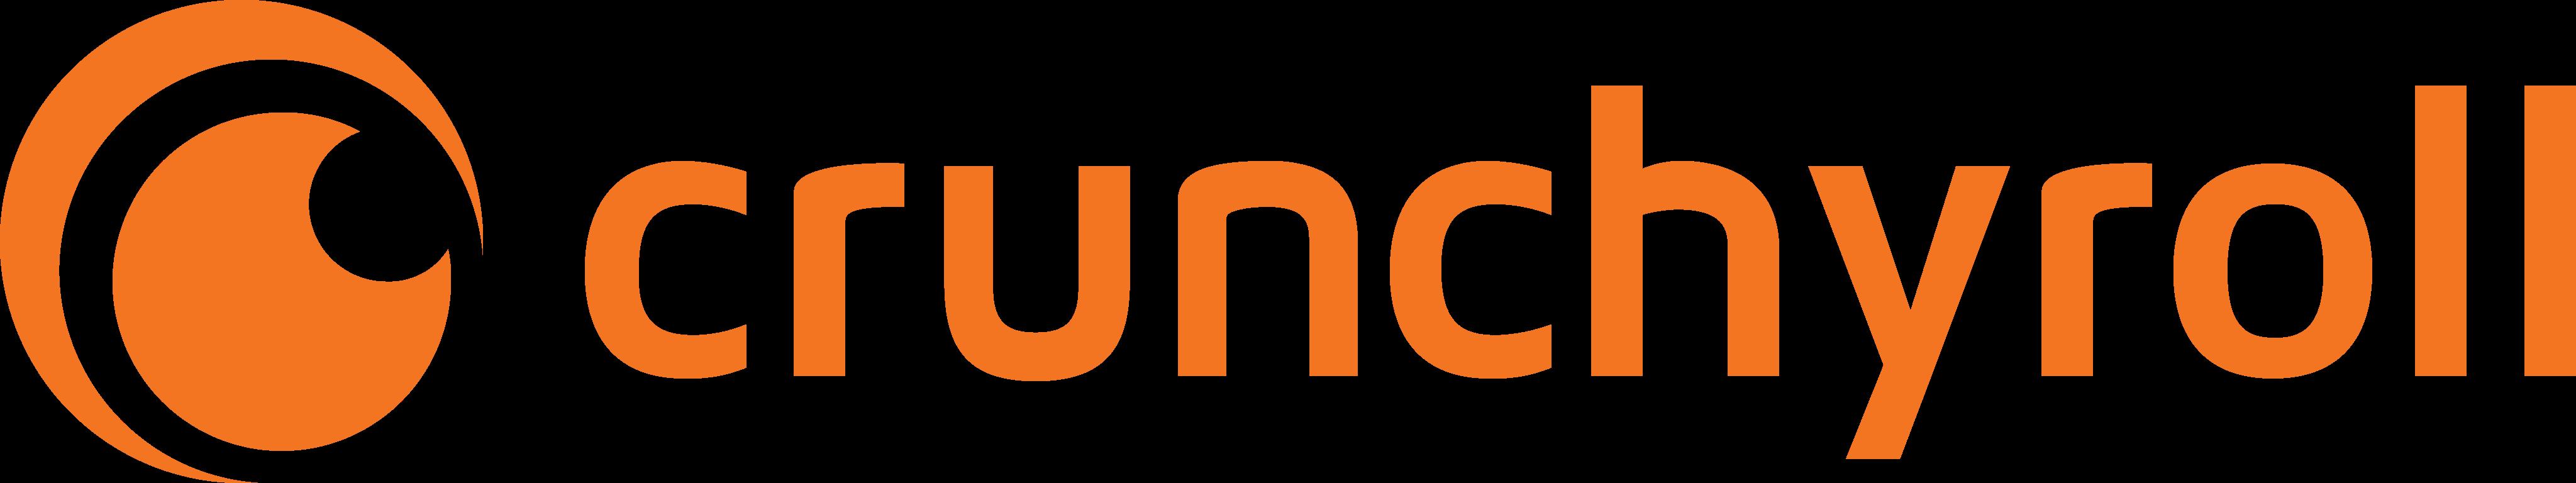 crunchyroll logo - Crunchyroll Logo